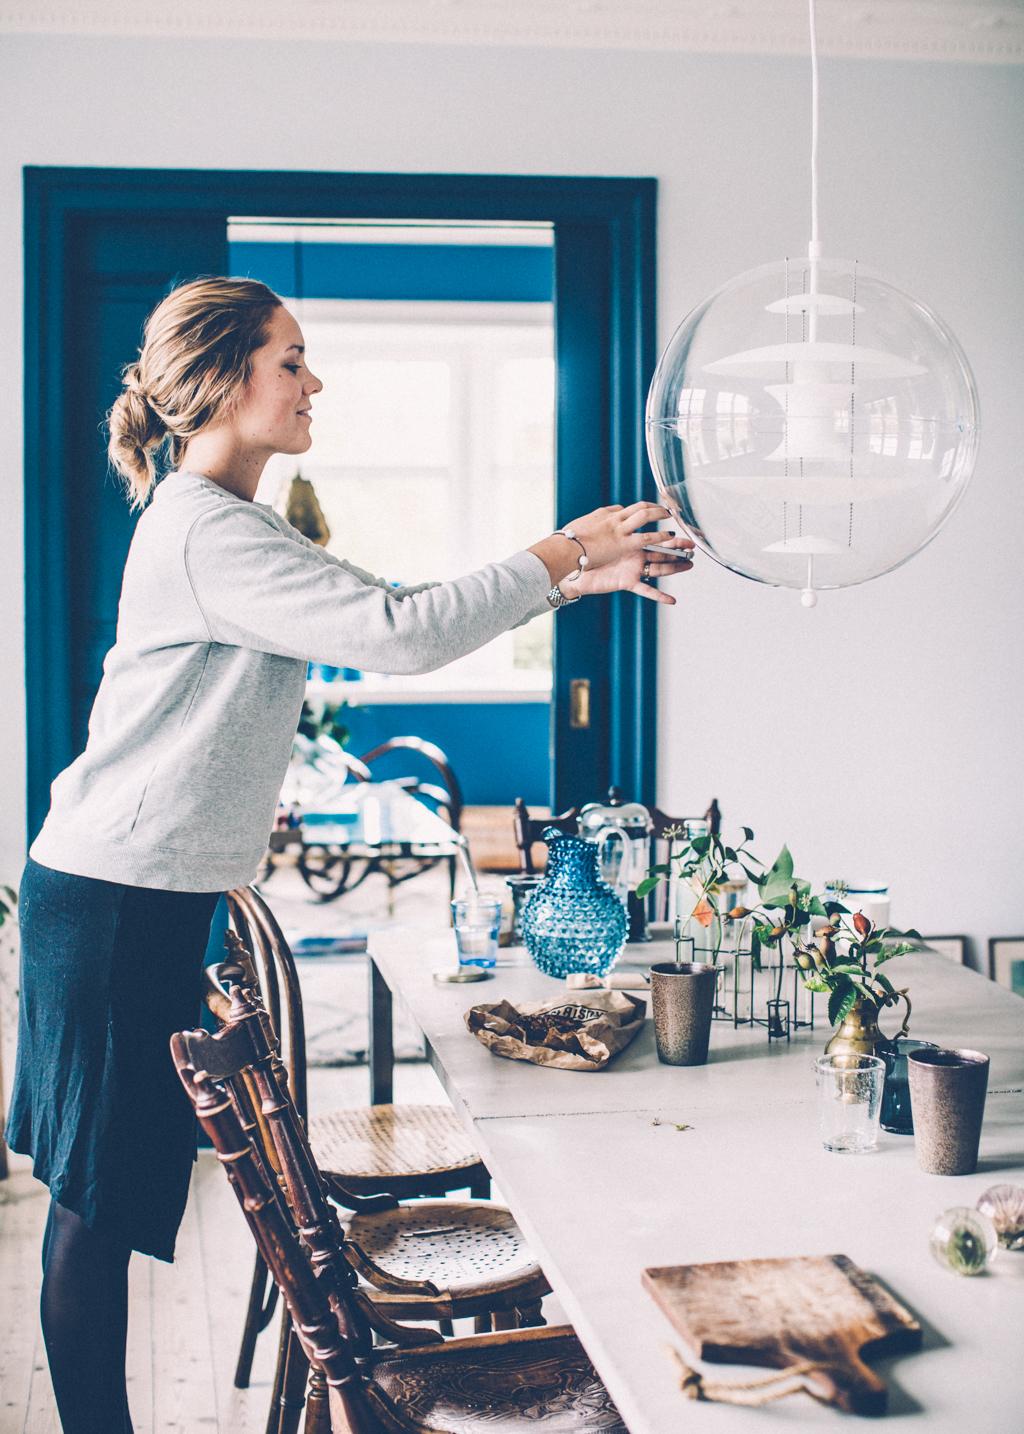 behind the scenes_Kristin_ lagerqvist-4987